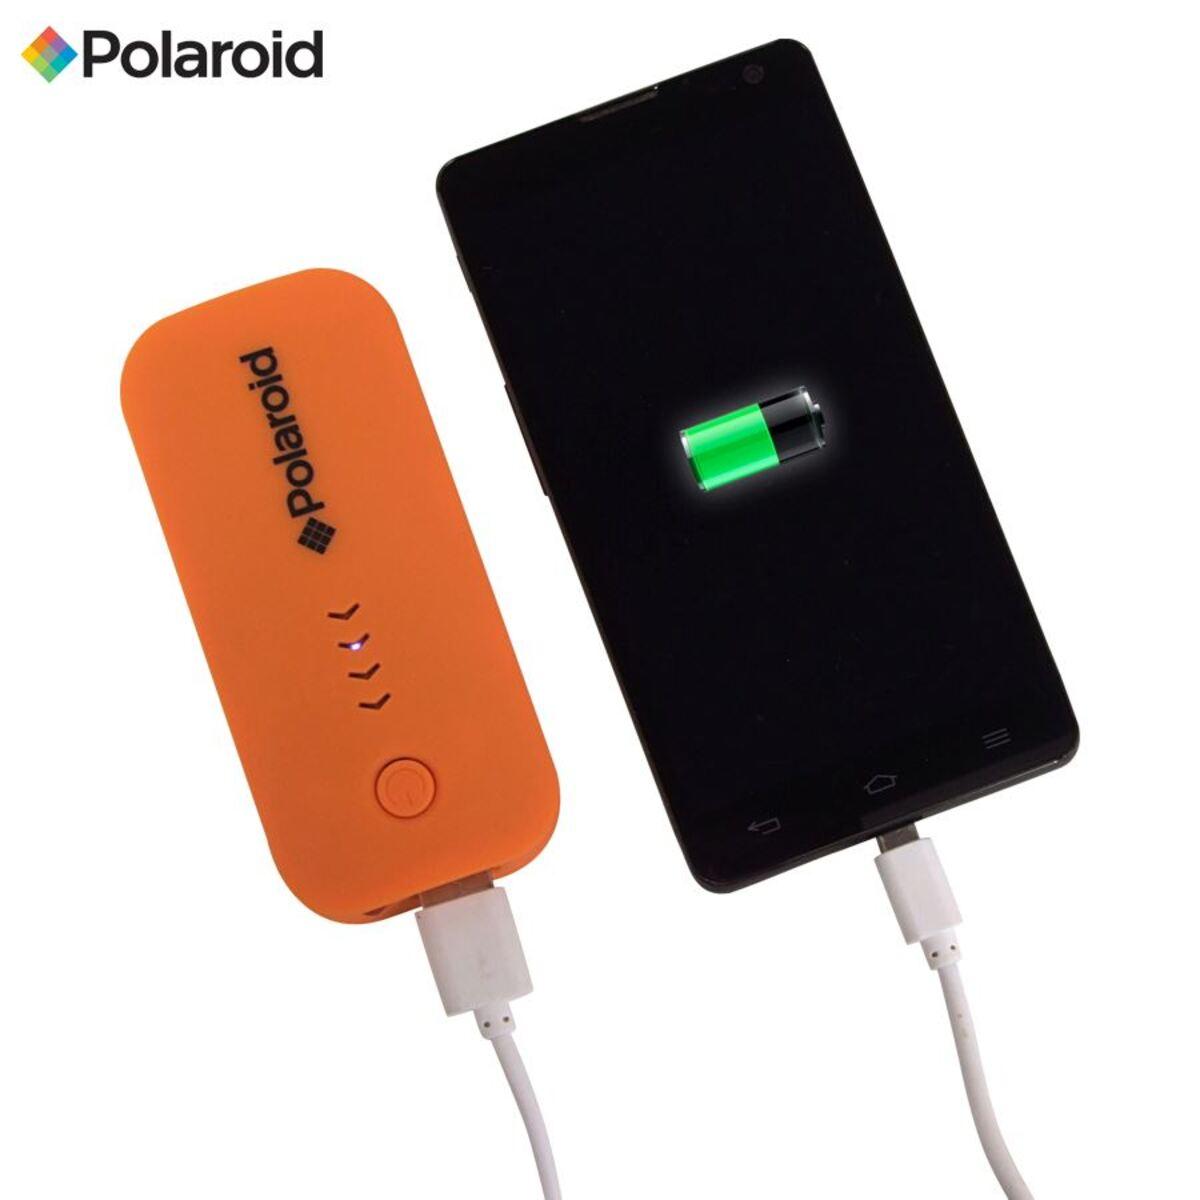 Bild 1 von Polaroid Power Bank Mobiler Akku-Pack 4000mAh Orange